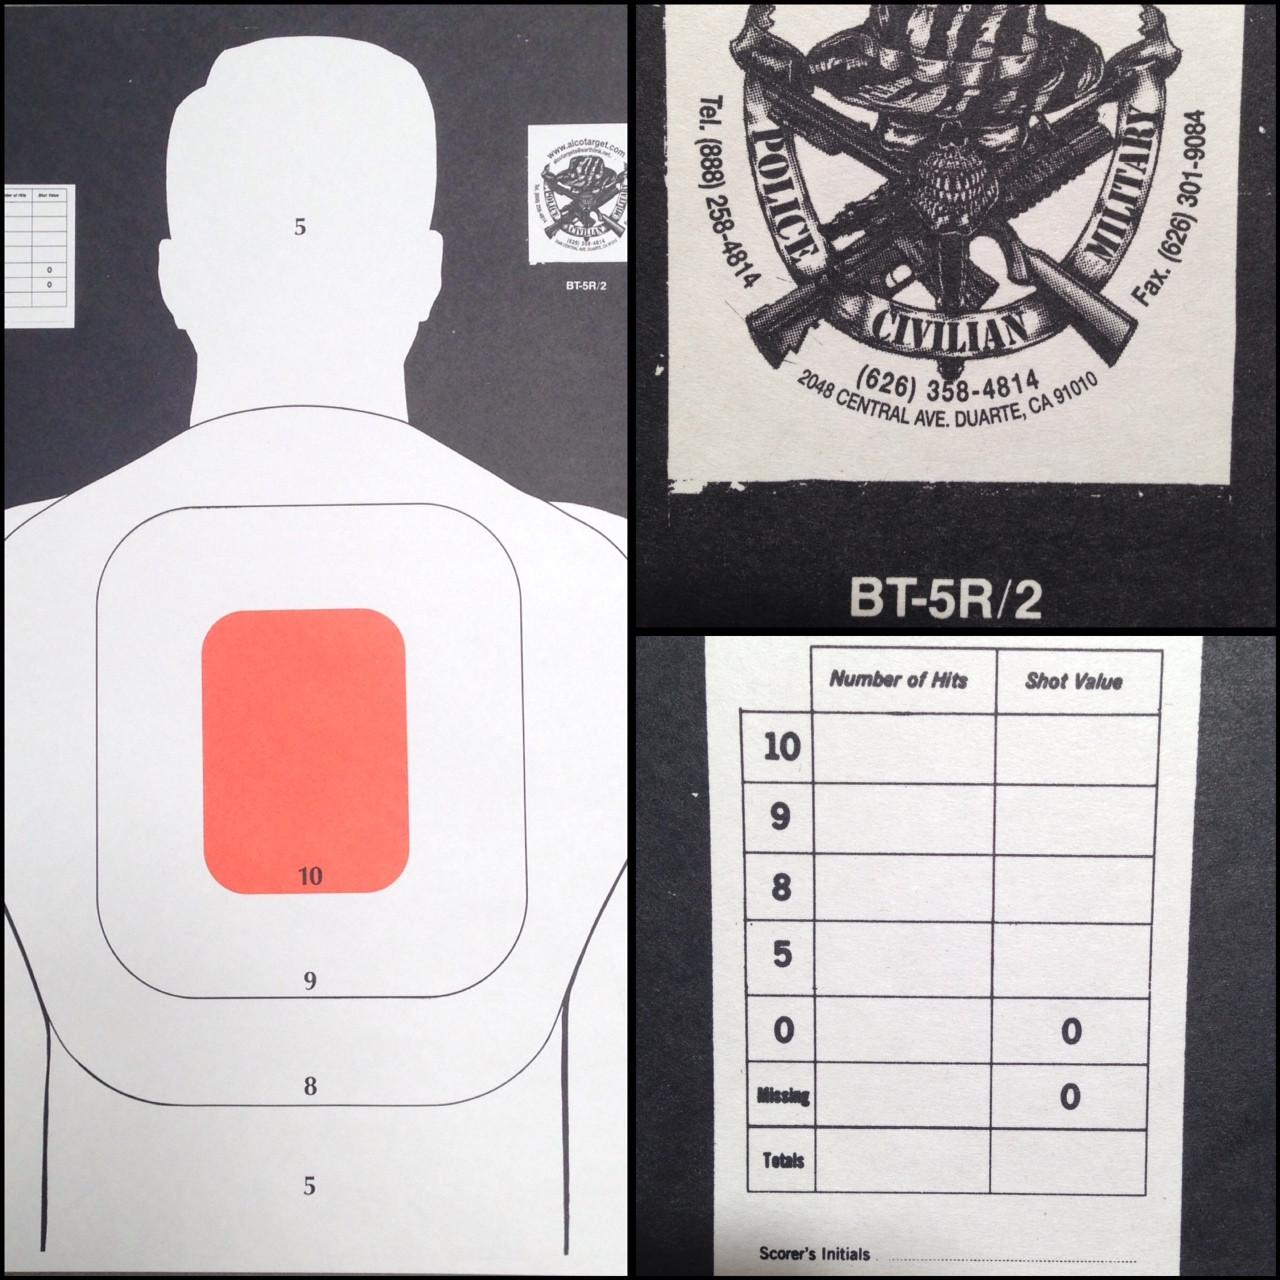 BT-5R/2 Shooting Target